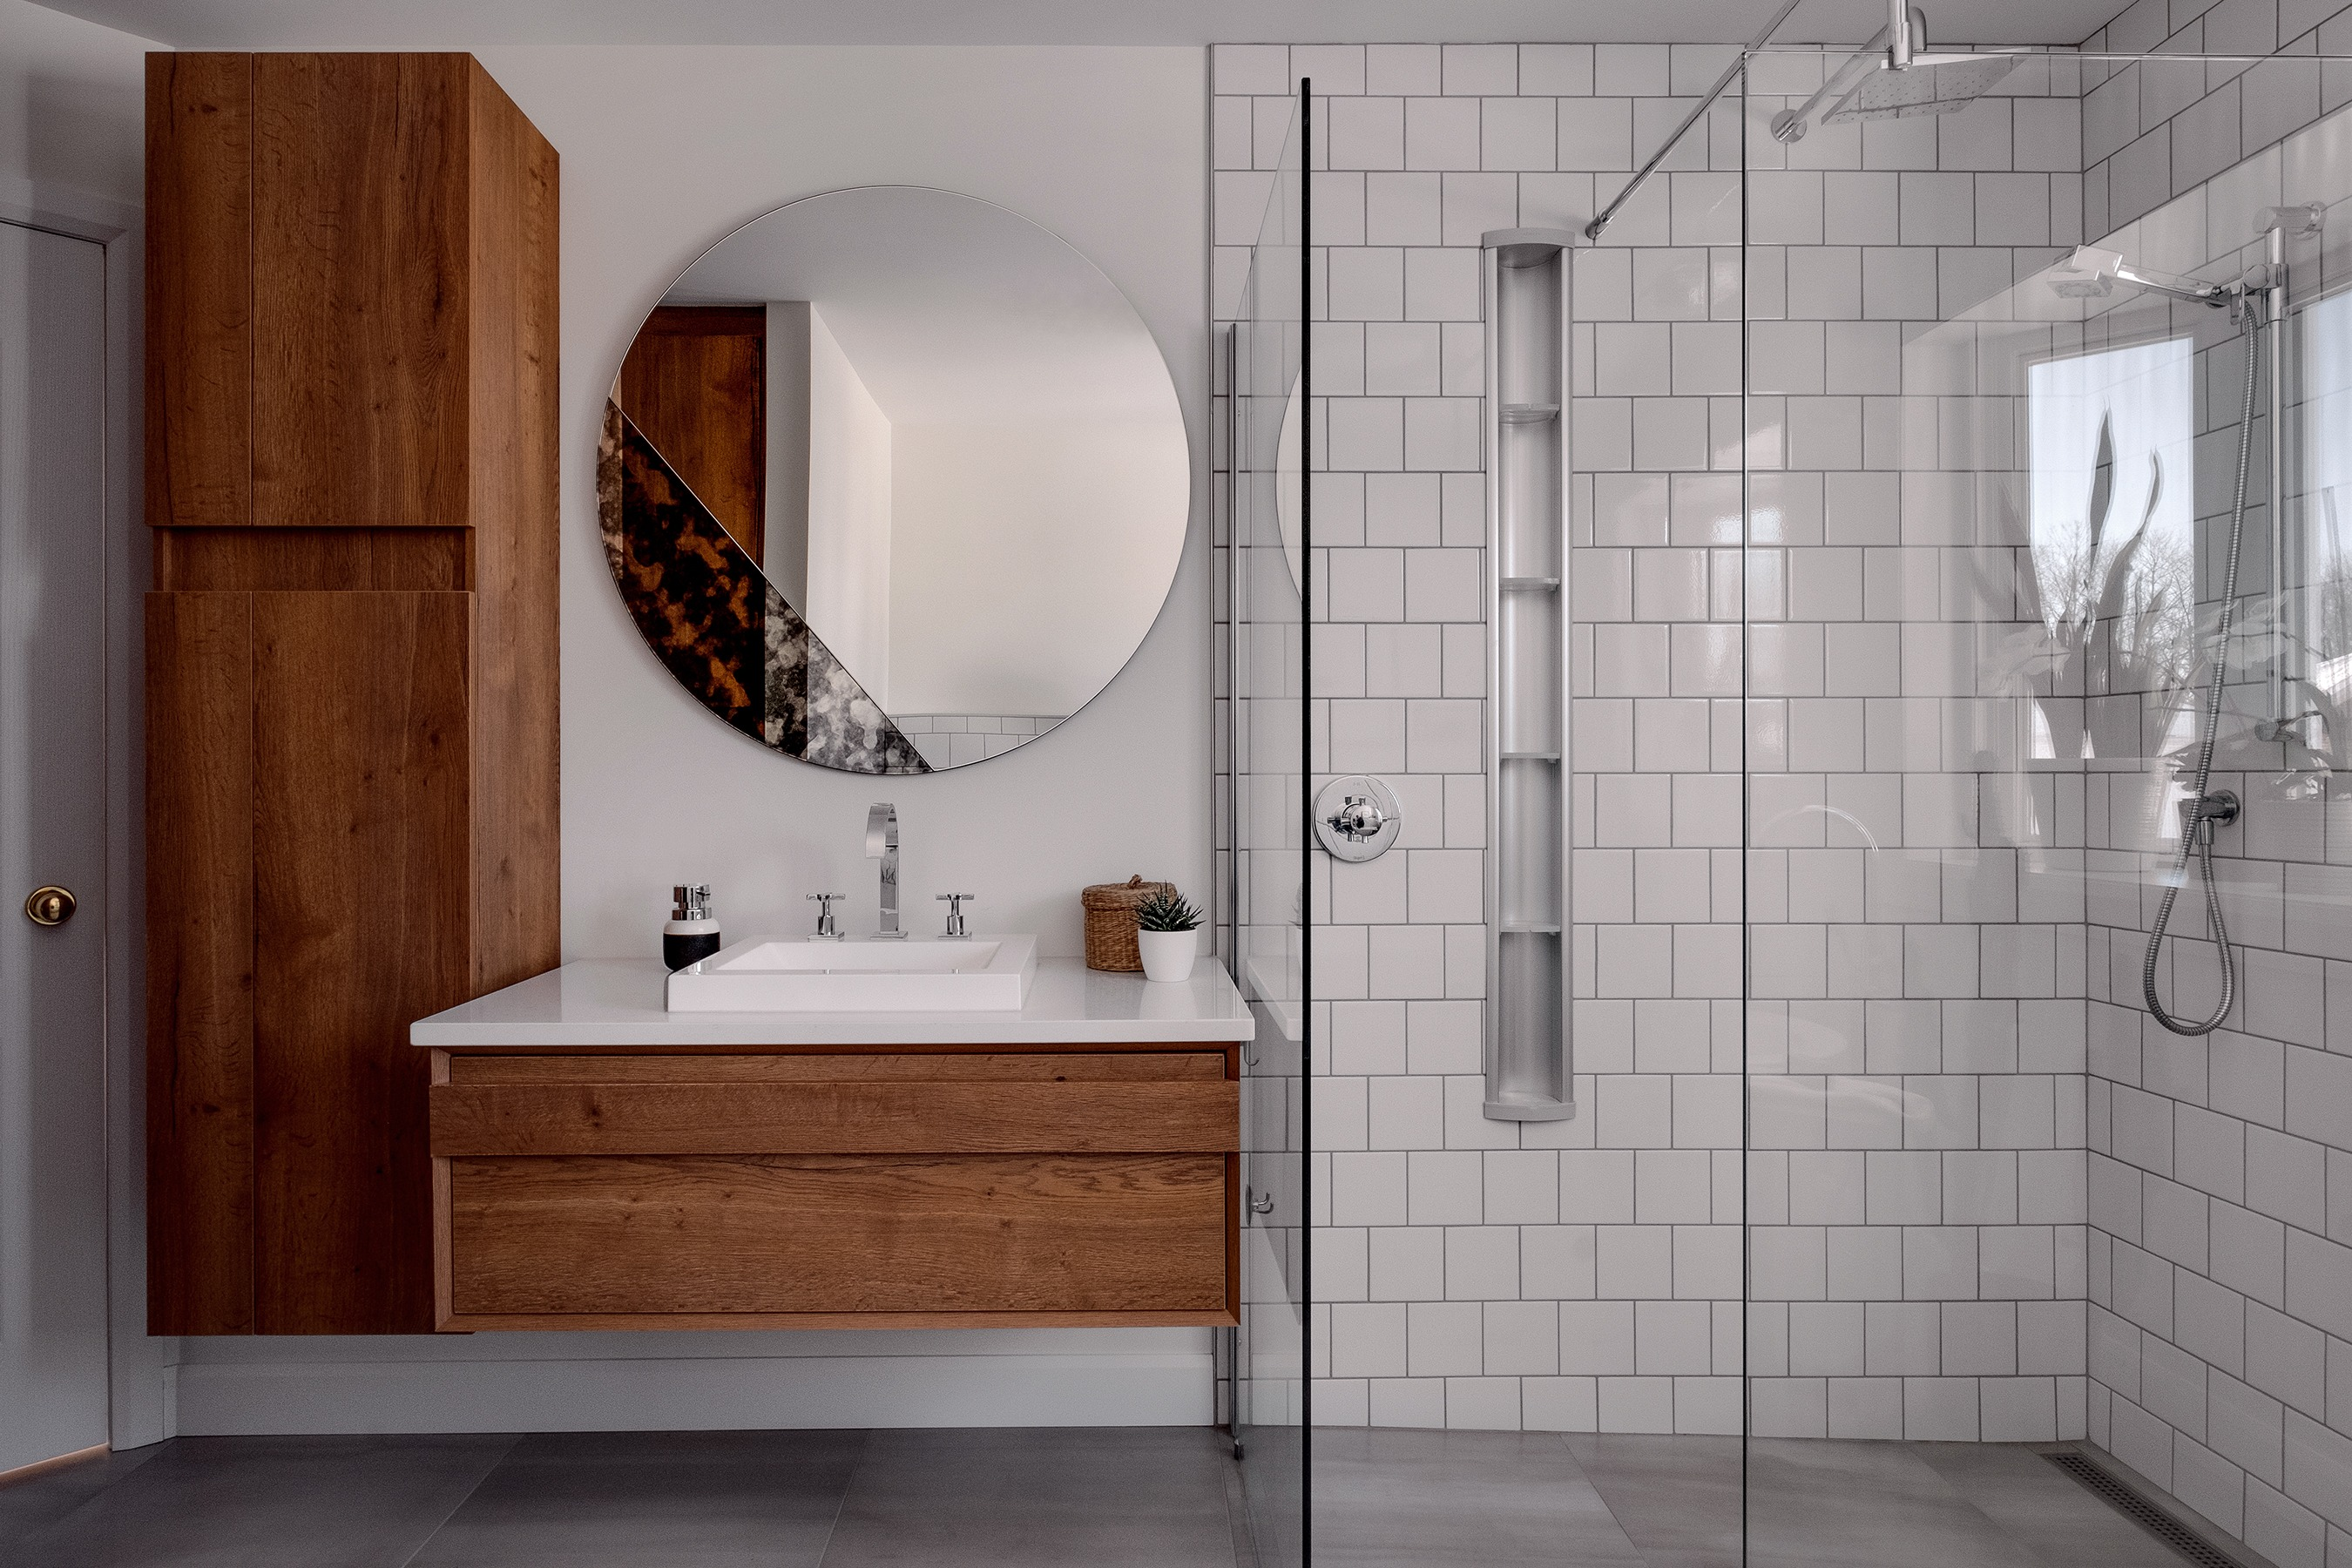 Salle de bain Félix-Leclerc